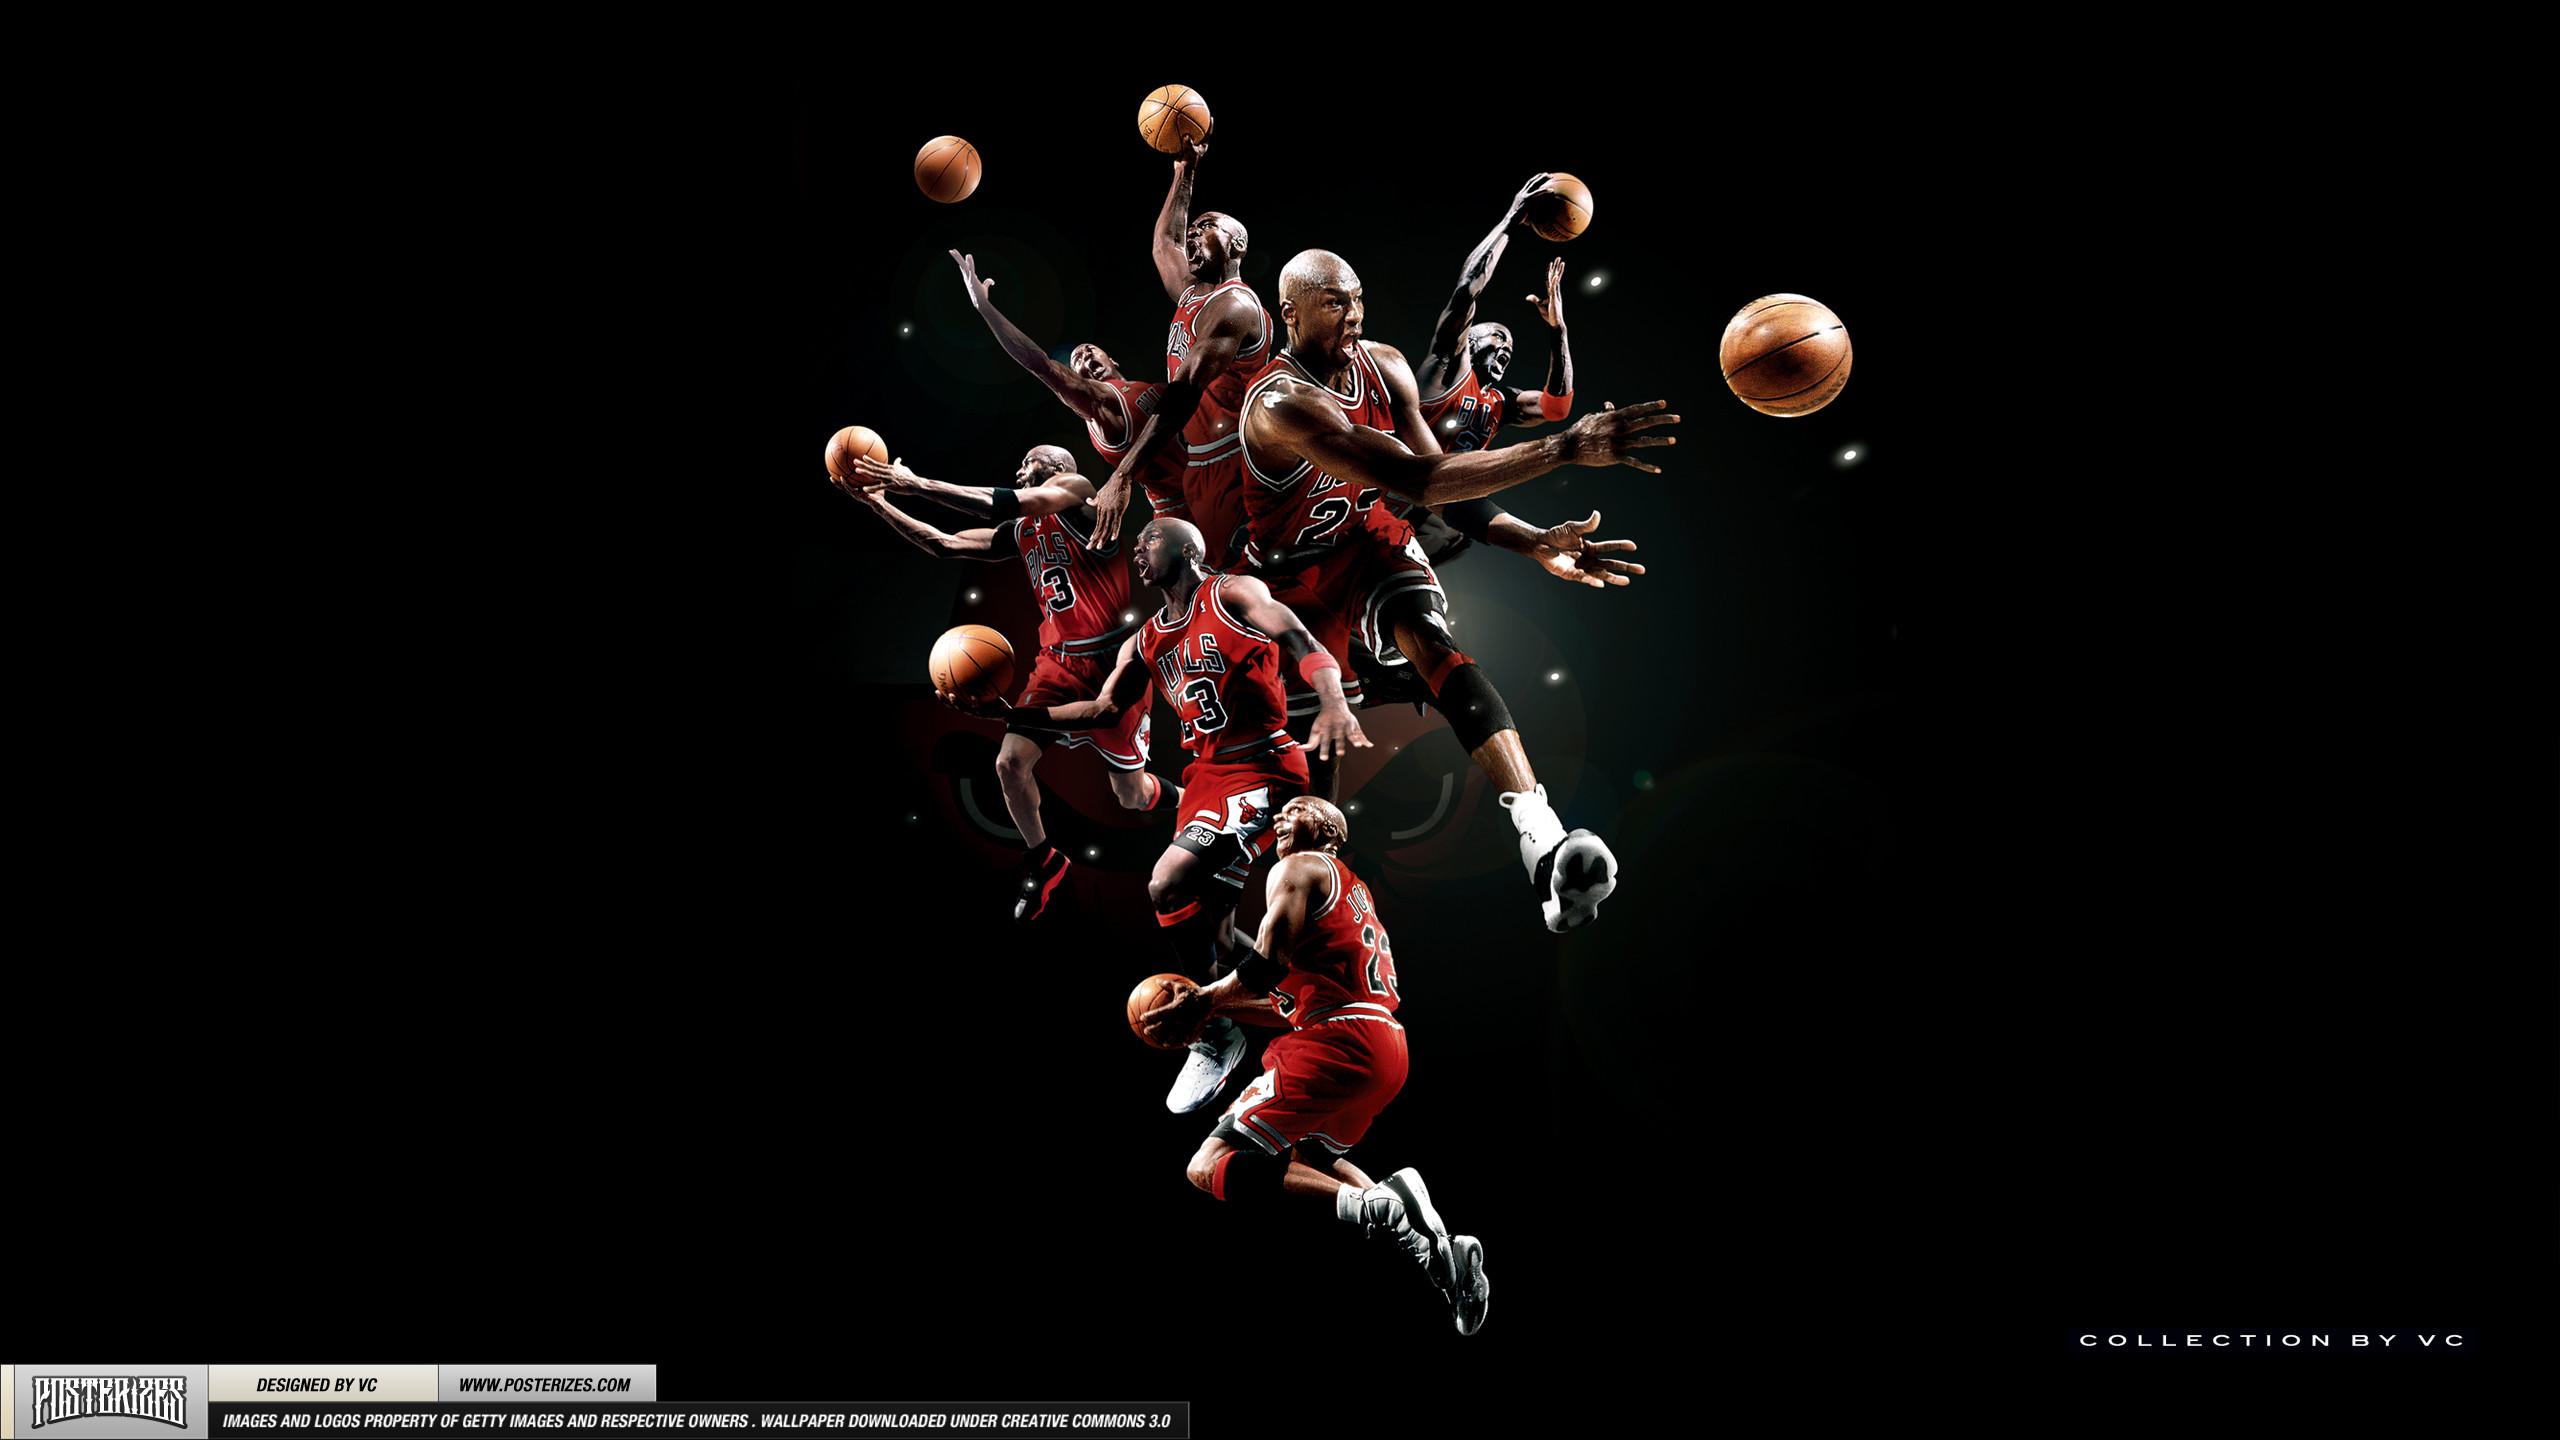 69 Jordan 3 Wallpapers on WallpaperPlay 2560x1440